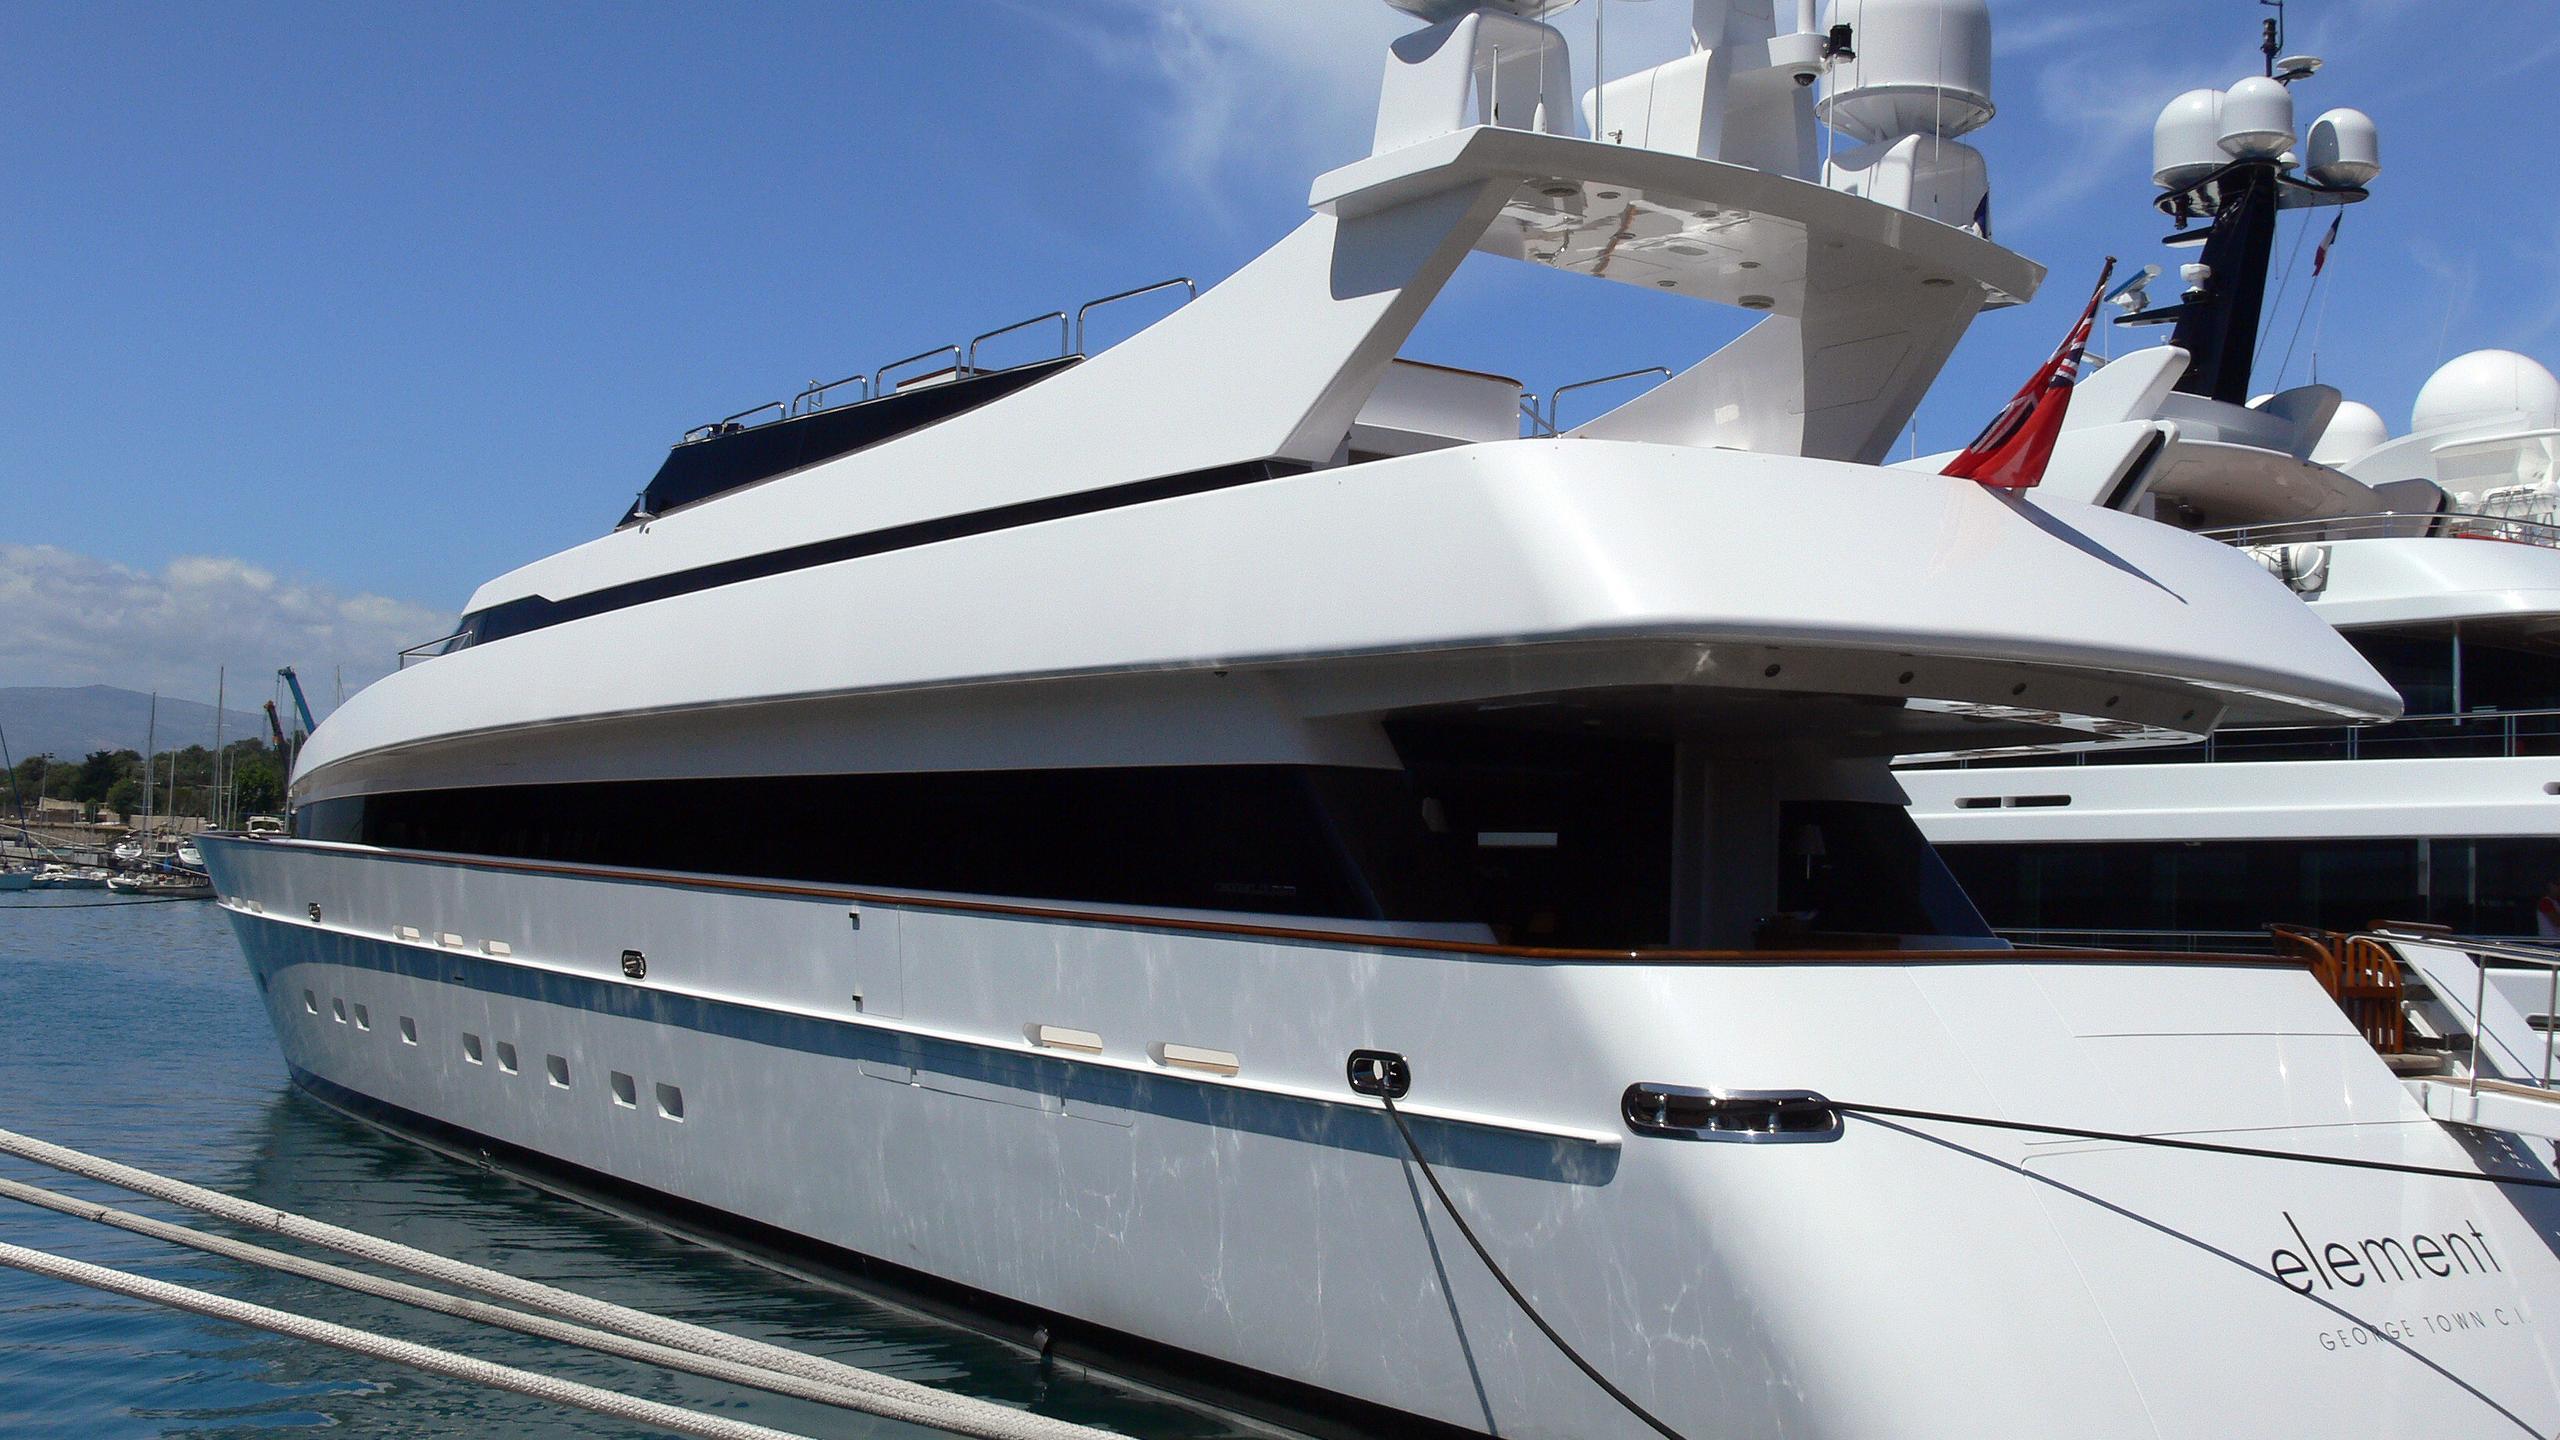 element-motor-yacht-cantieri-di-pisa-2002-42m-stern